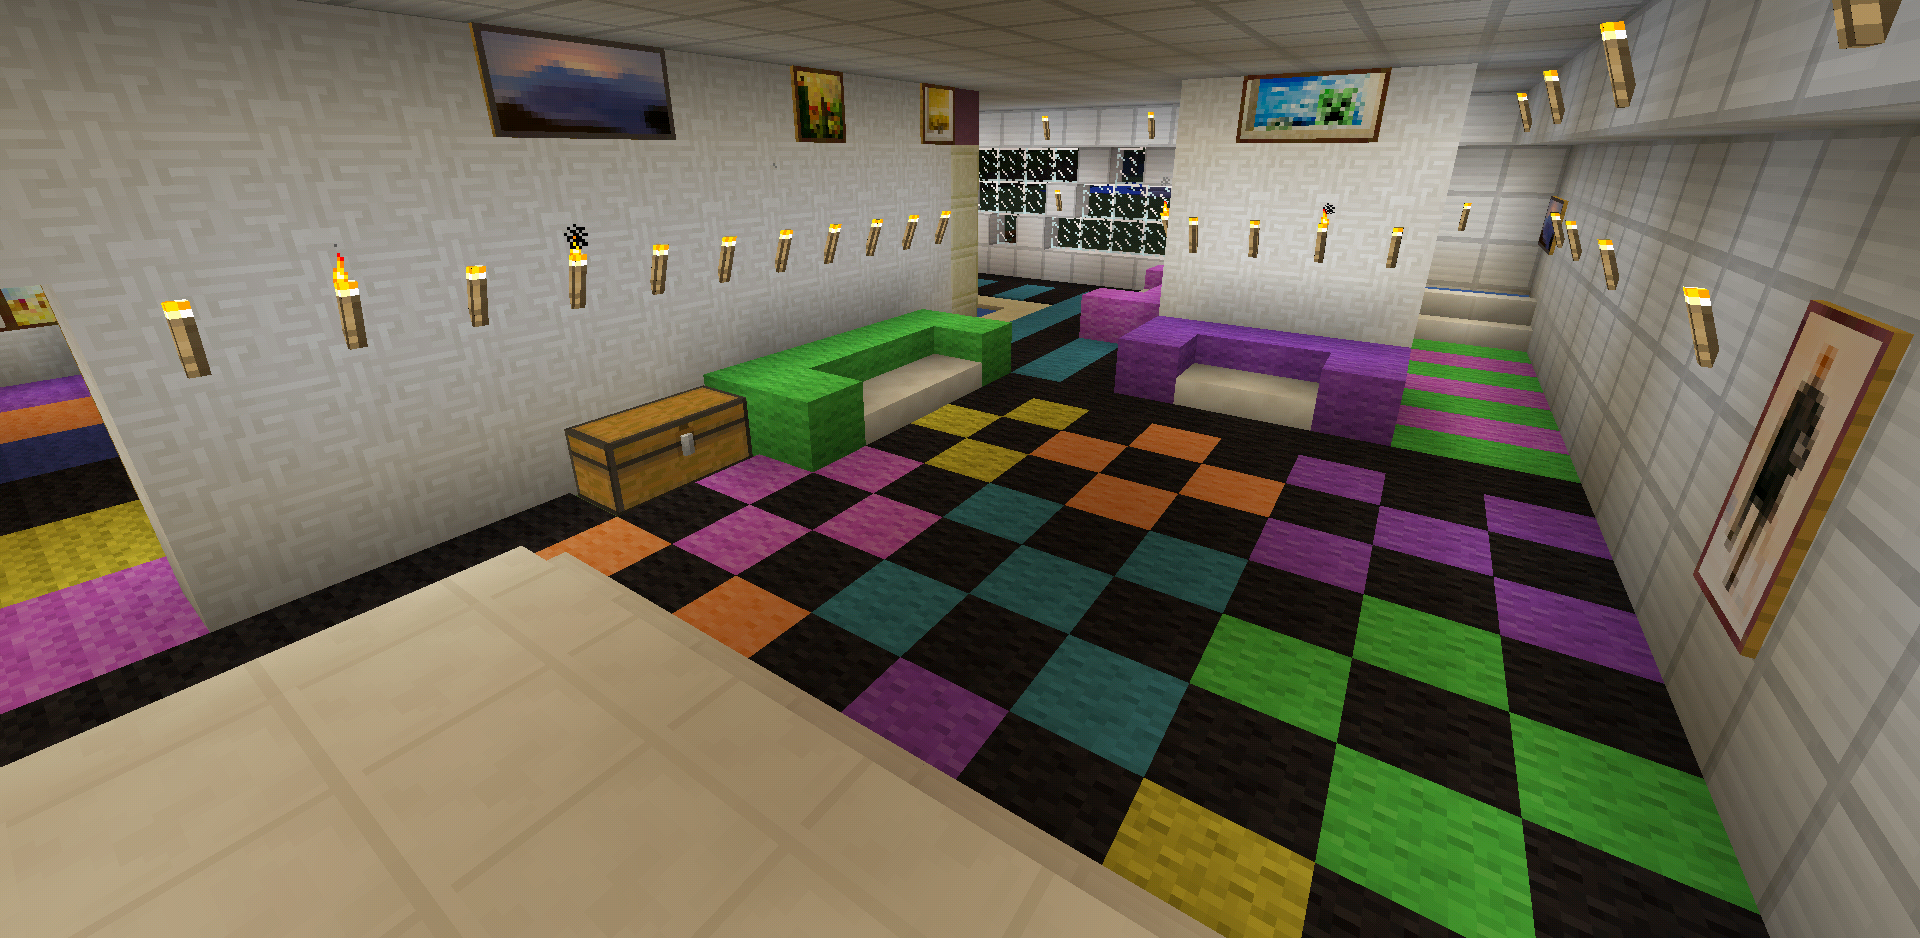 Minecraft Rainbow Checker Carpet Design Colorful Minecraft